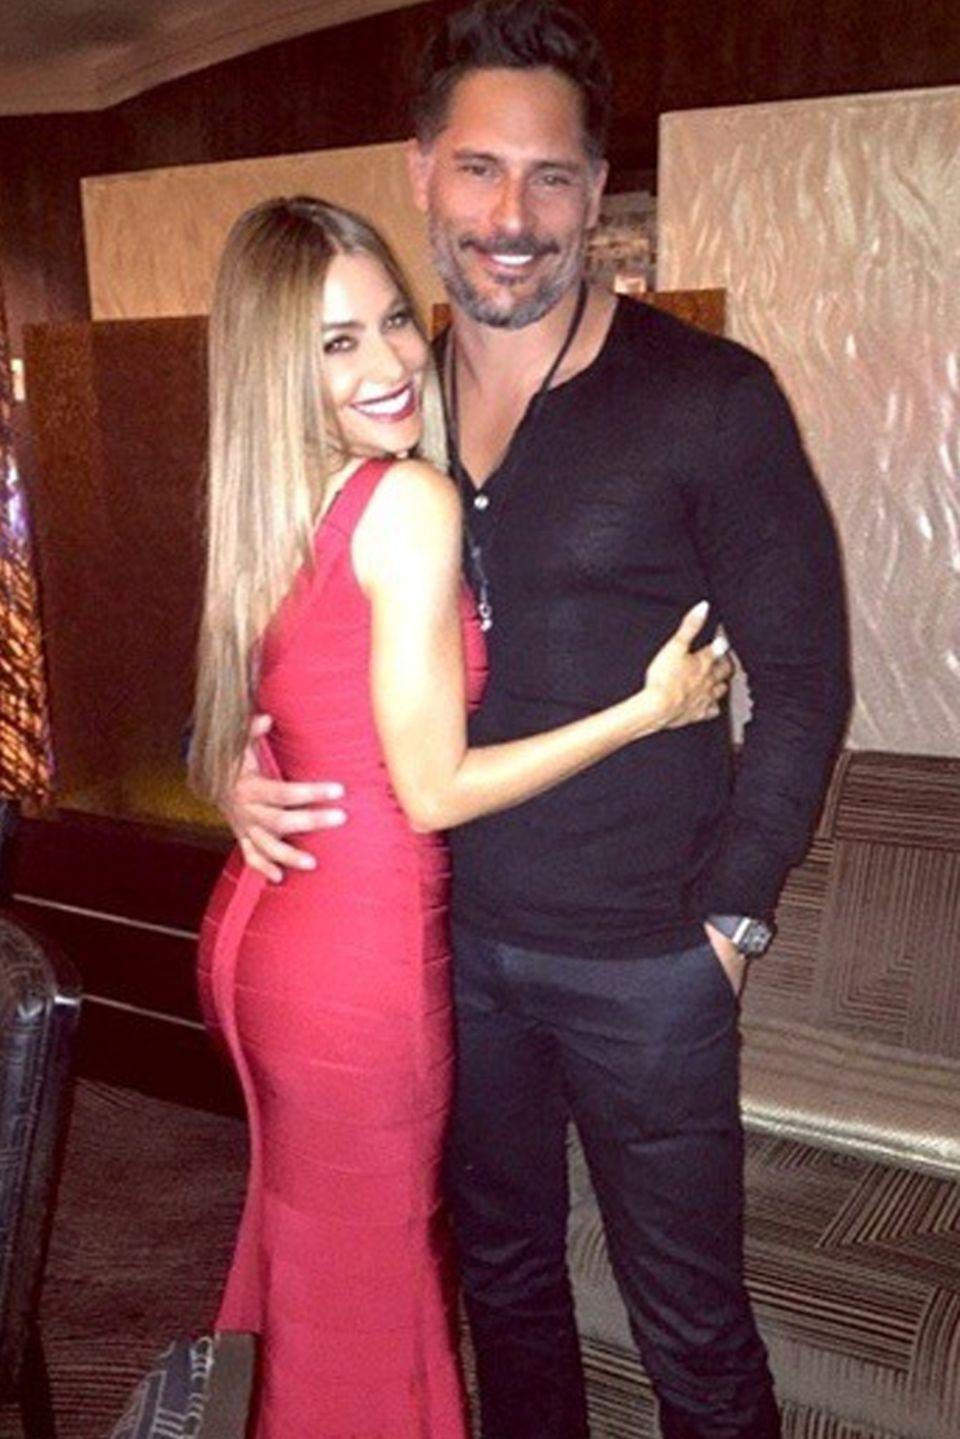 Sofia Vergara + Joe Manganiello